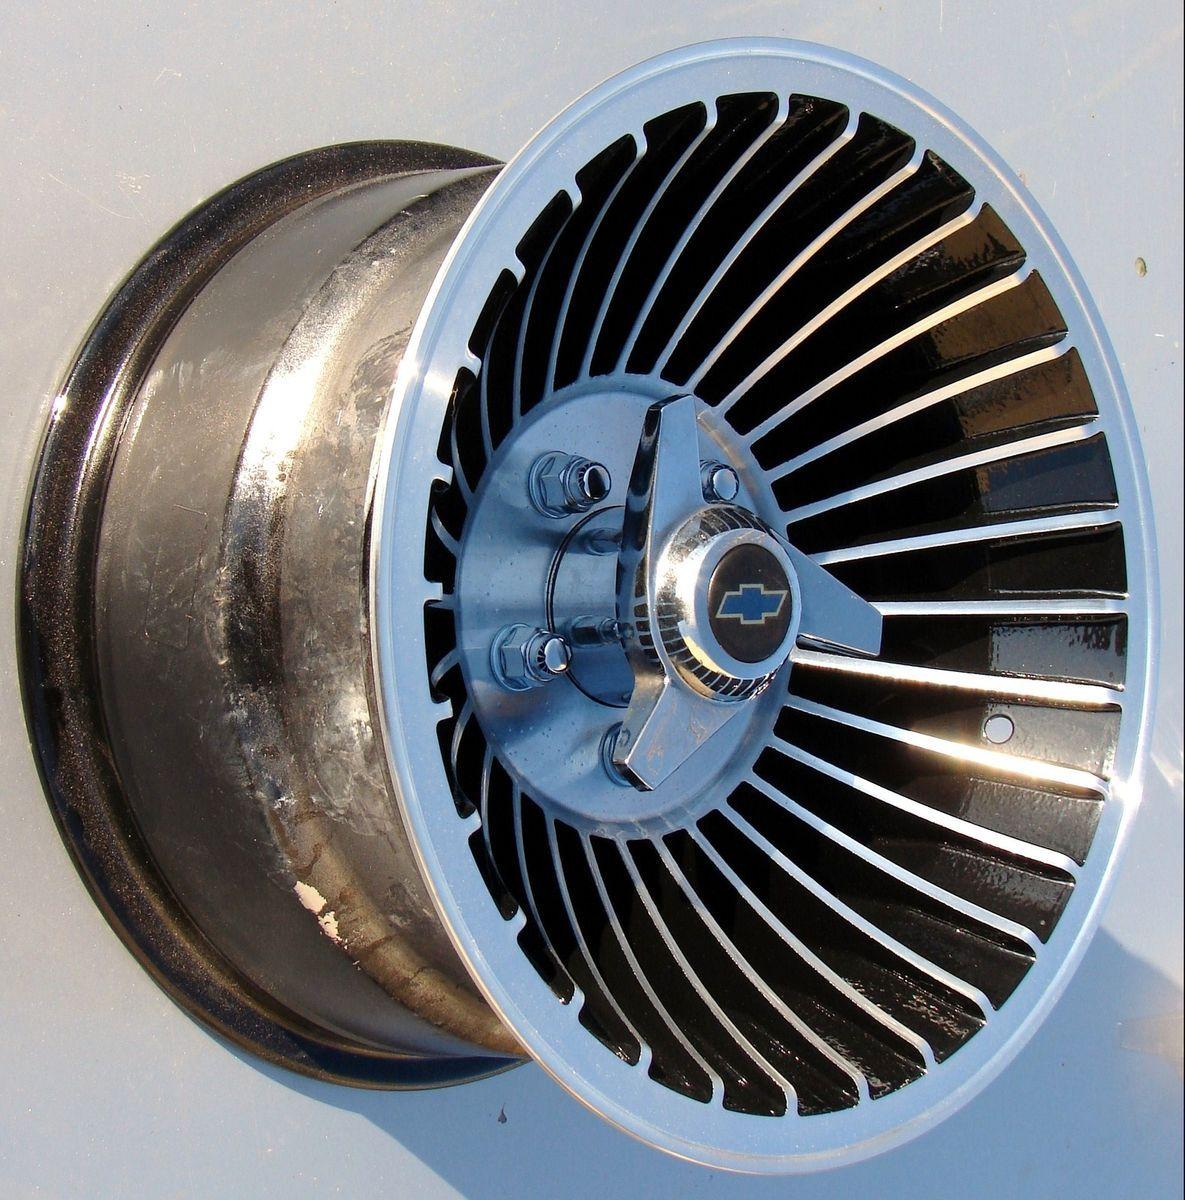 Western Wheels 15X8 5 Cyclone Turbine Wheels Mags Rims 5x5 Chevy Truck